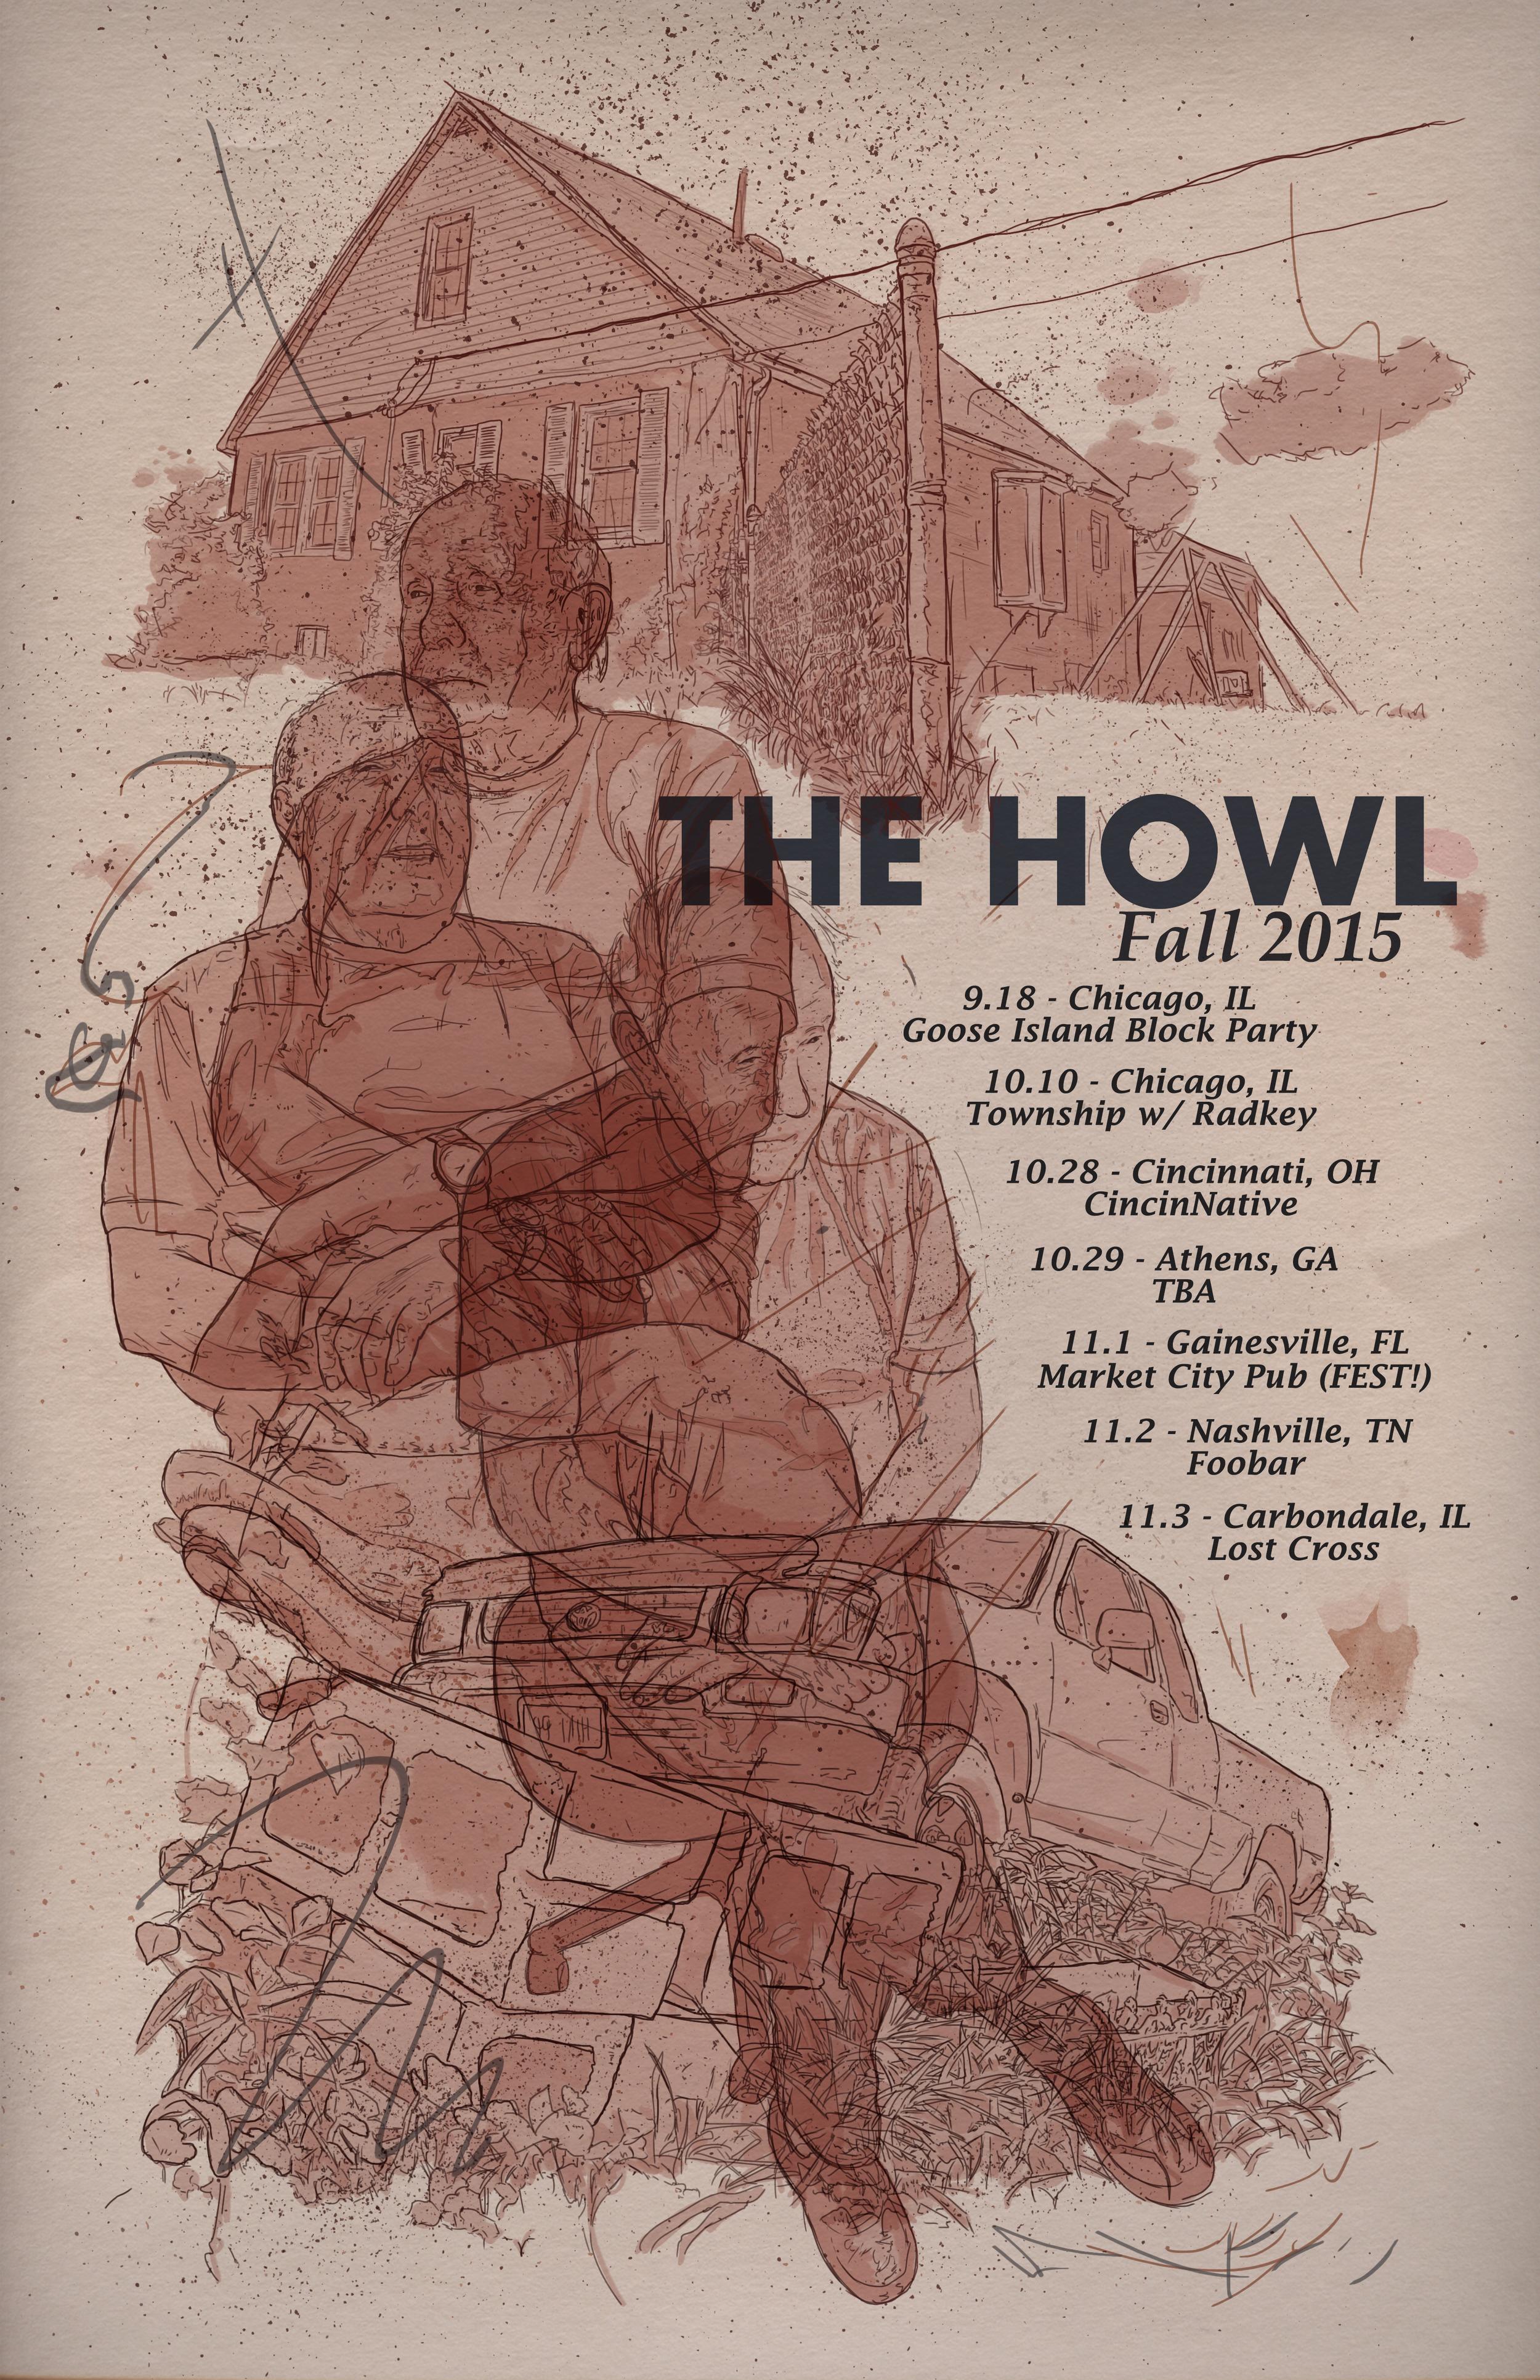 The Howl Fall 2015 Tour